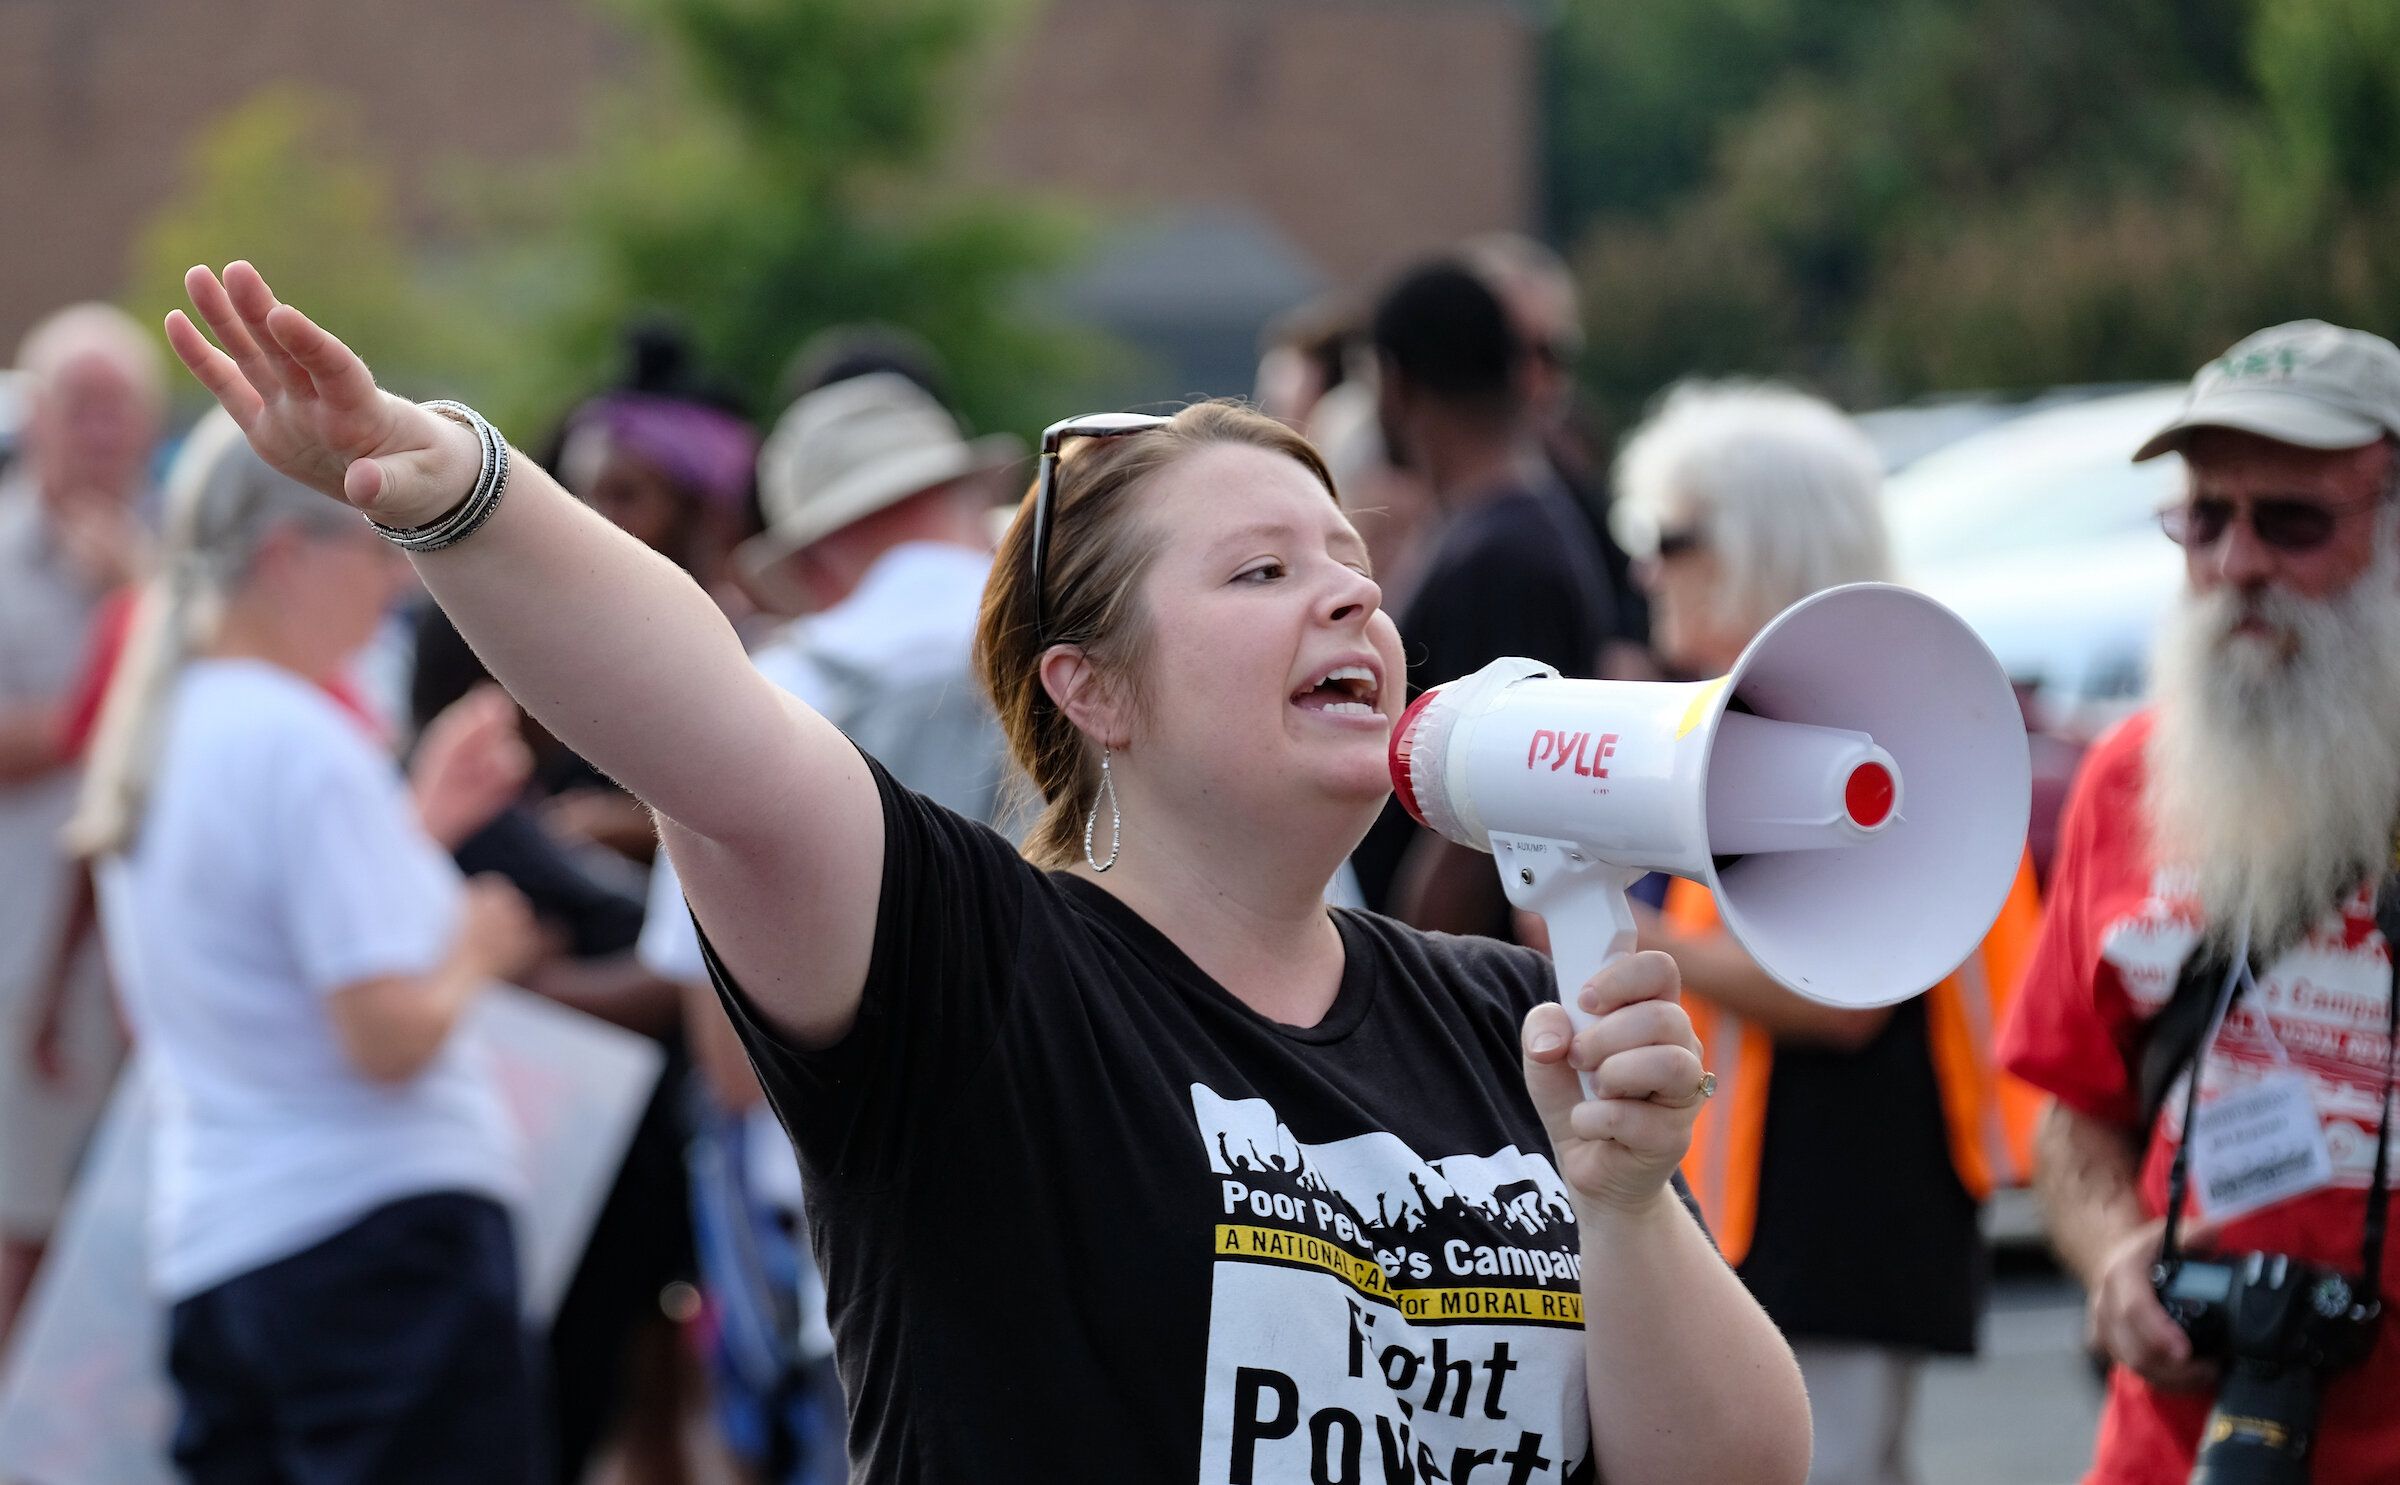 2019 0930 NC Greensboro MORE march by Steve Pavey HopeinFocus-17.jpg